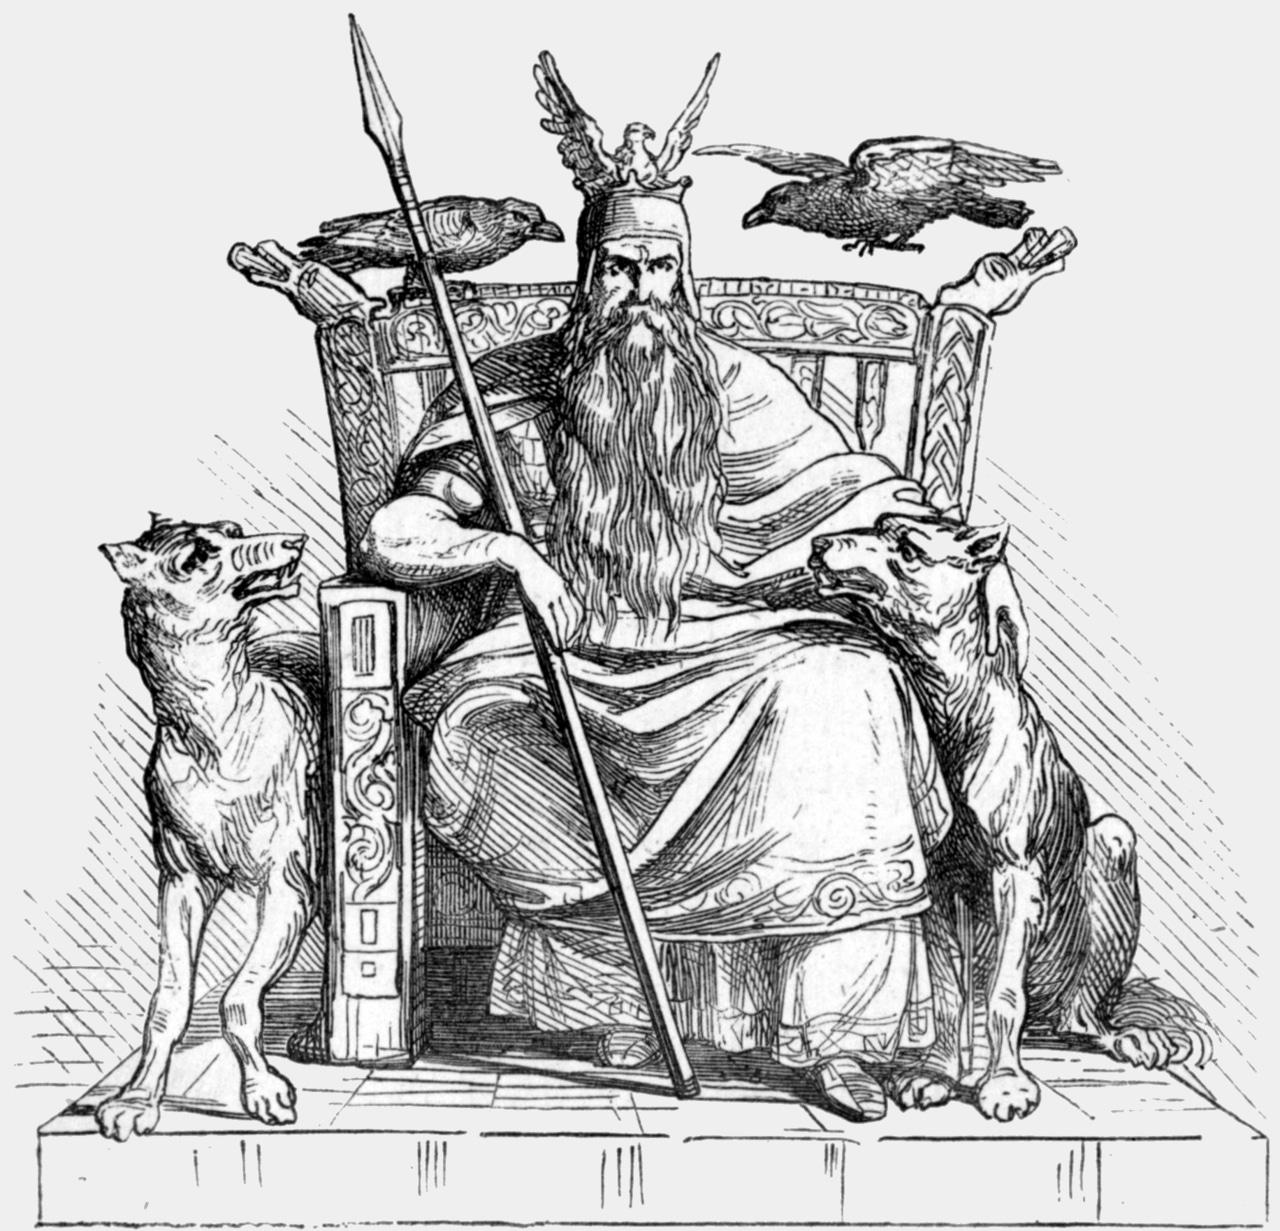 The Odin Times